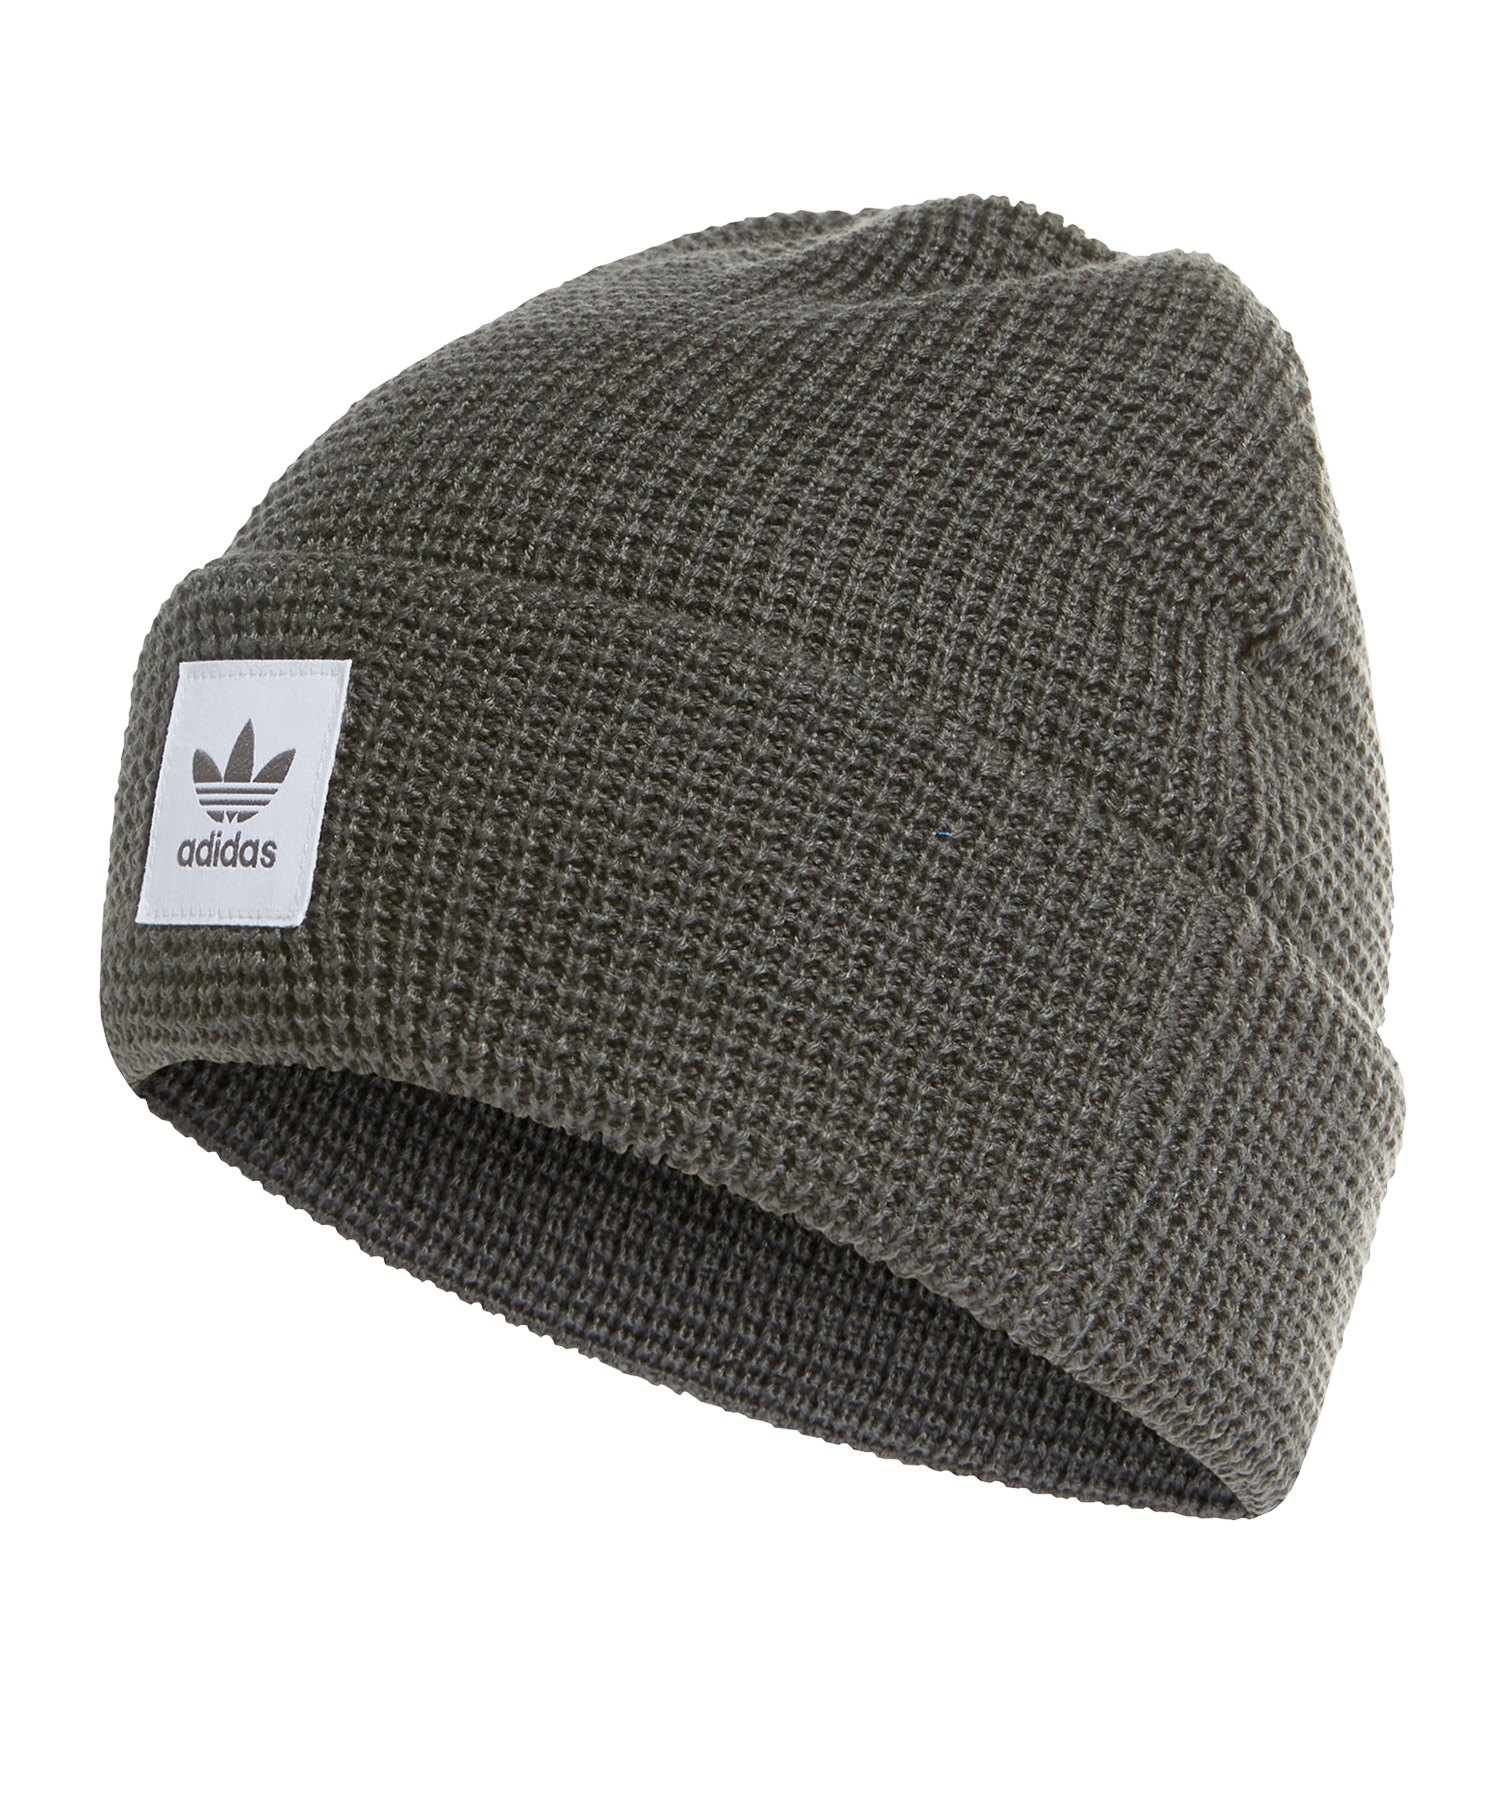 adidas Originals Wuffle Cuff Cap Kappe Grau Weiss - grau